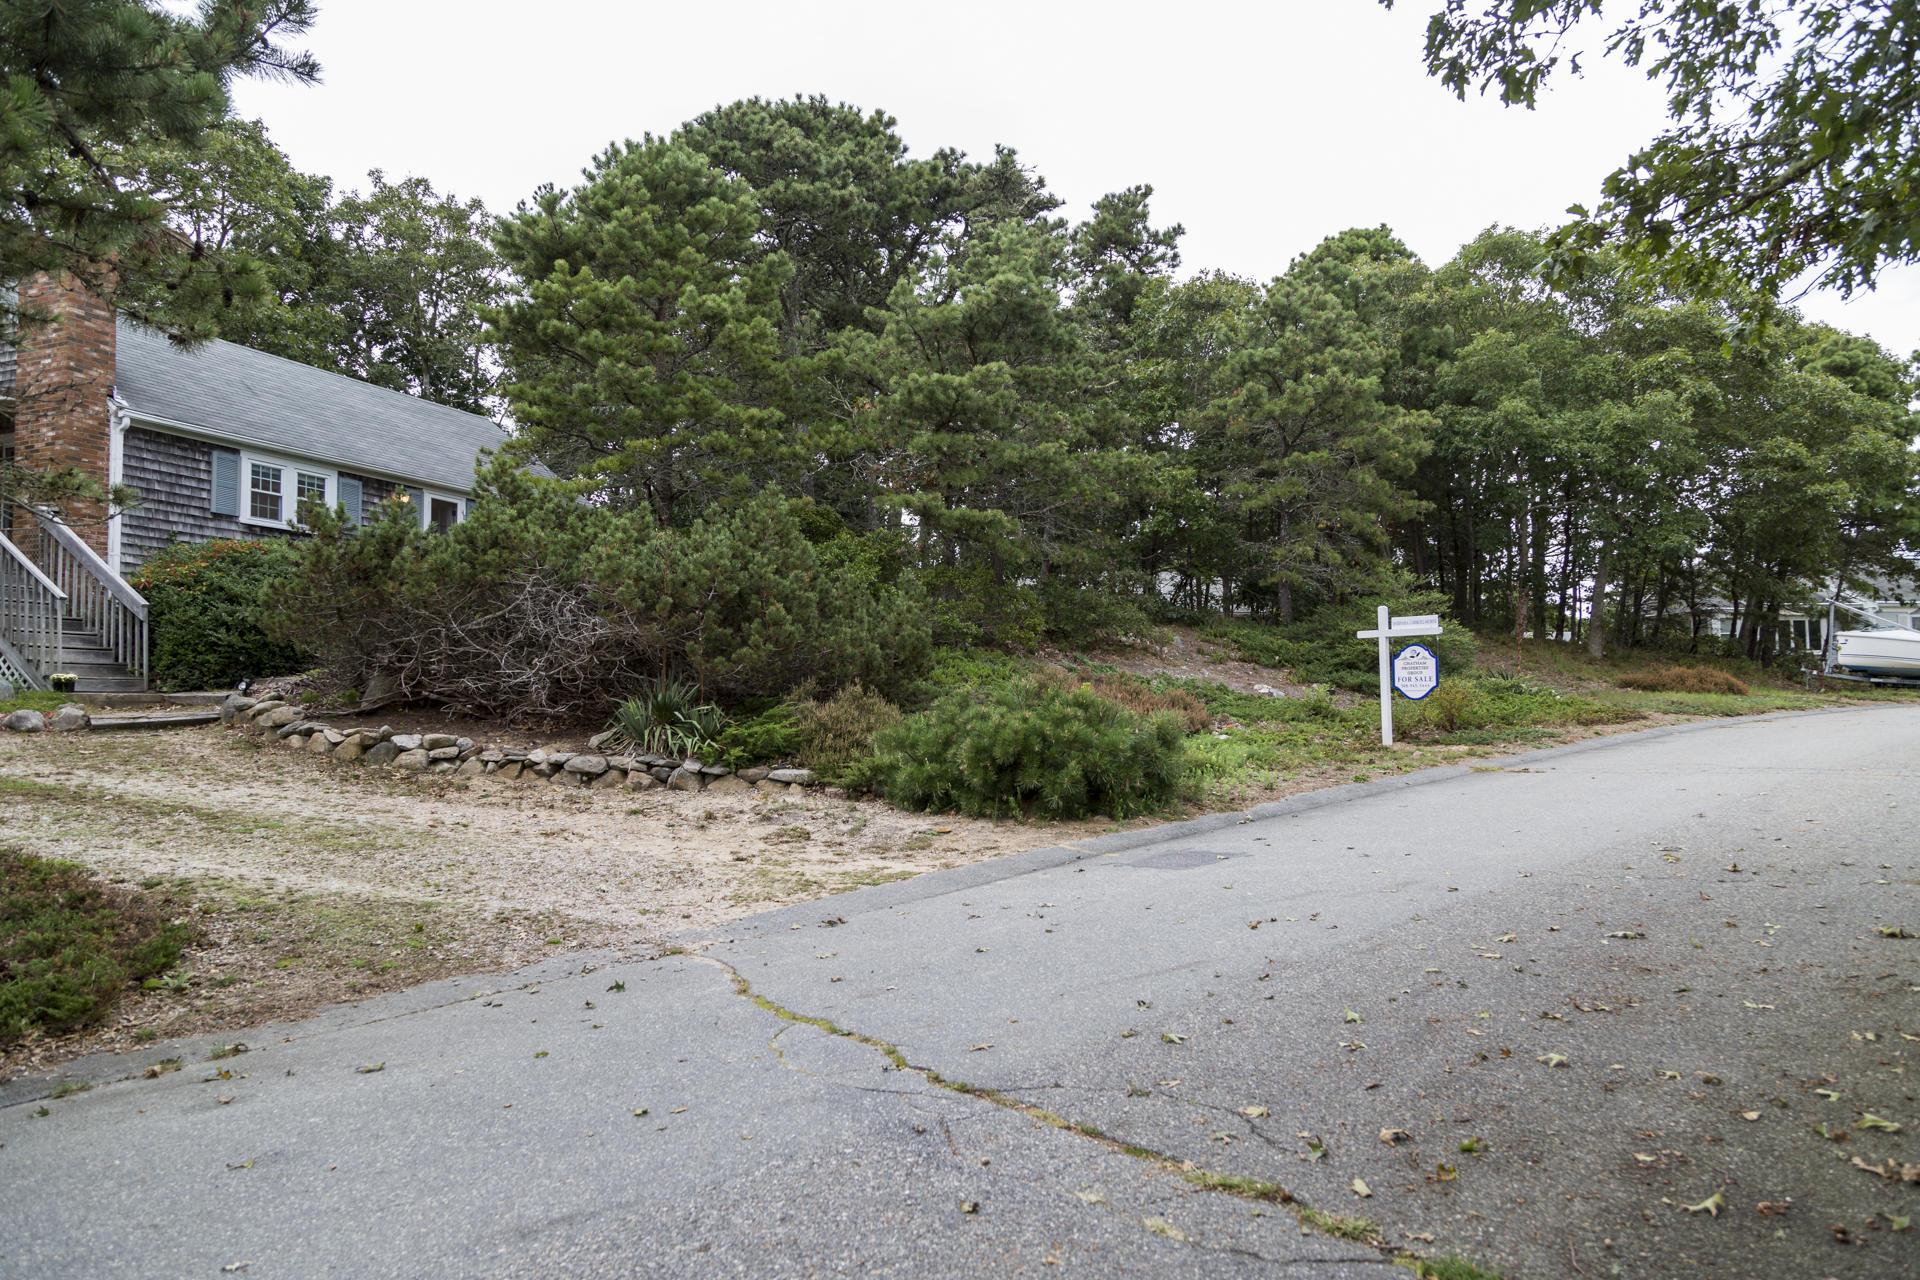 48 Overlook Drive, Chatham MA, 02633 - slide 16